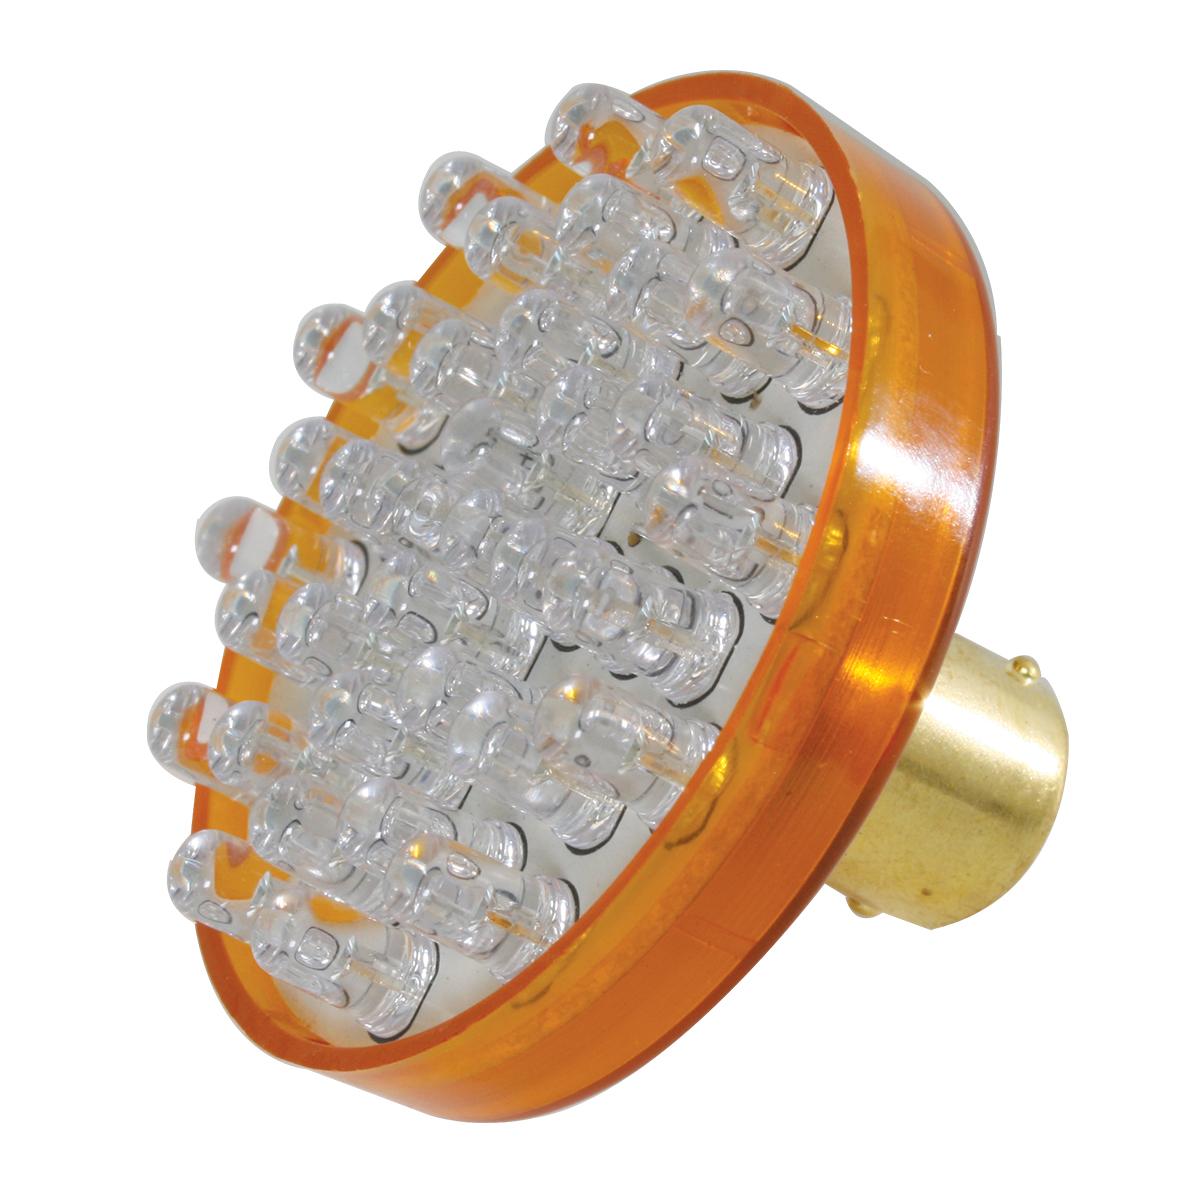 83940 Amber 1156 Single Directional 36 LED Light Bulb